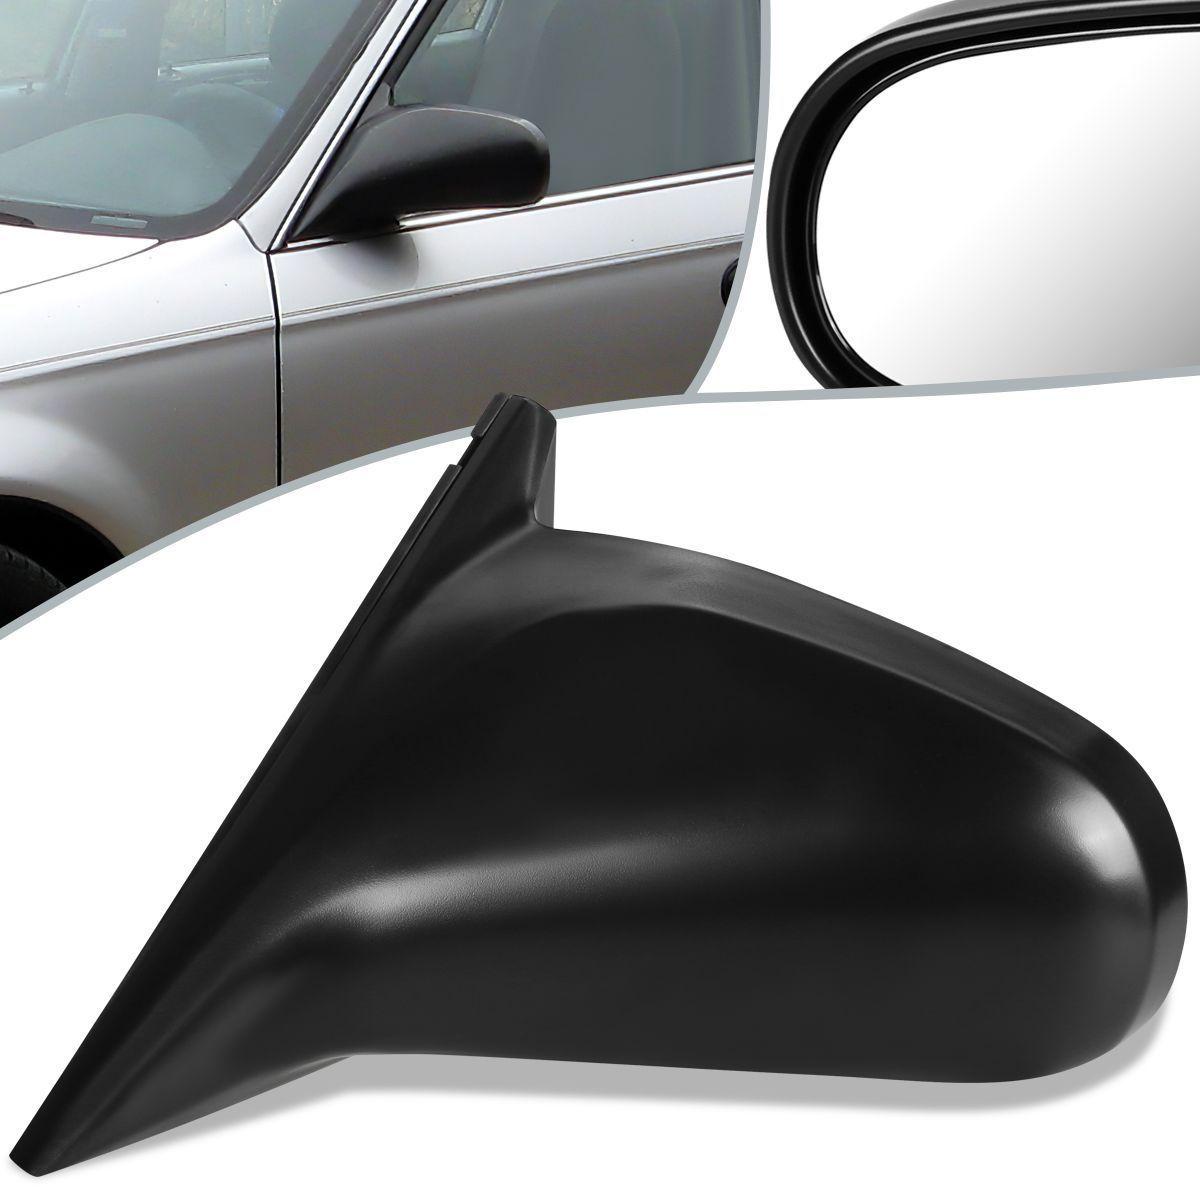 96 00 Honda Civic Sedan Powered Left Driver Side Door Mirror Ho1320101 Honda Civic Sedan Honda Civic Civic Sedan